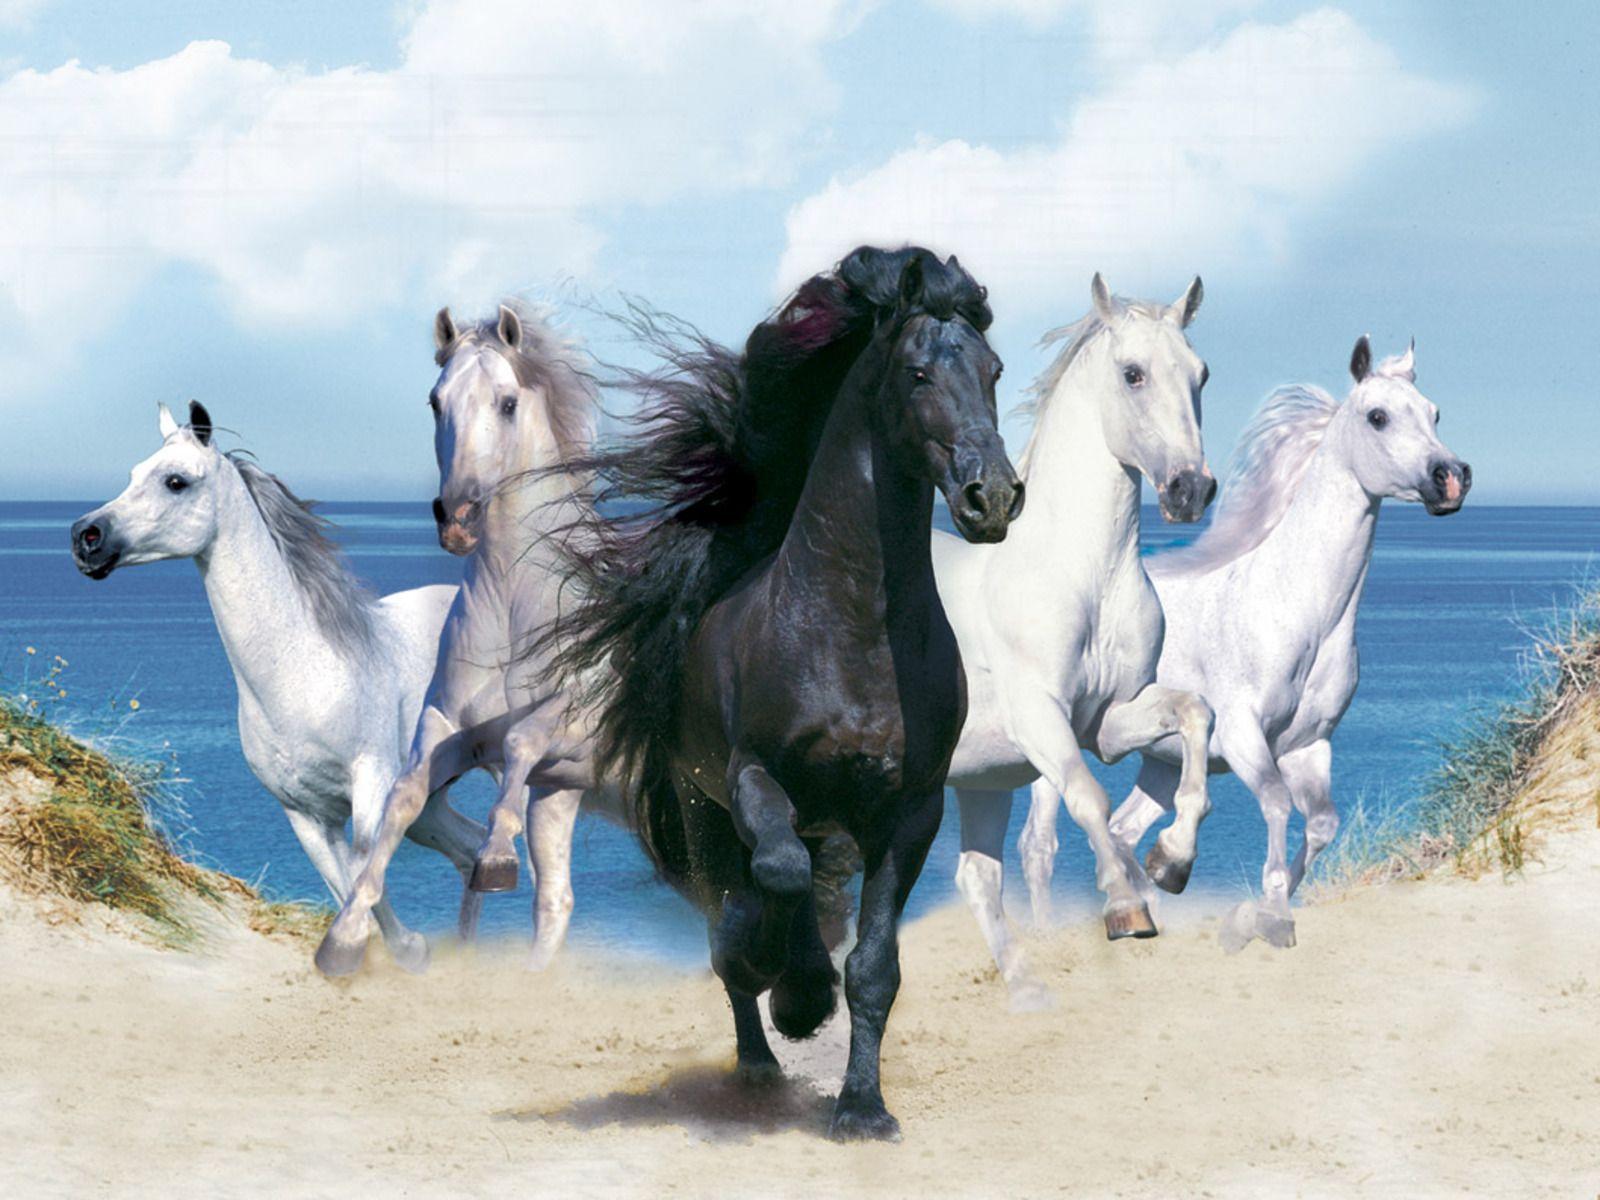 Most Inspiring Wallpaper Horse Ocean - ed59729ba4b554df14db6ad75b0d75bb  Picture_92773.jpg